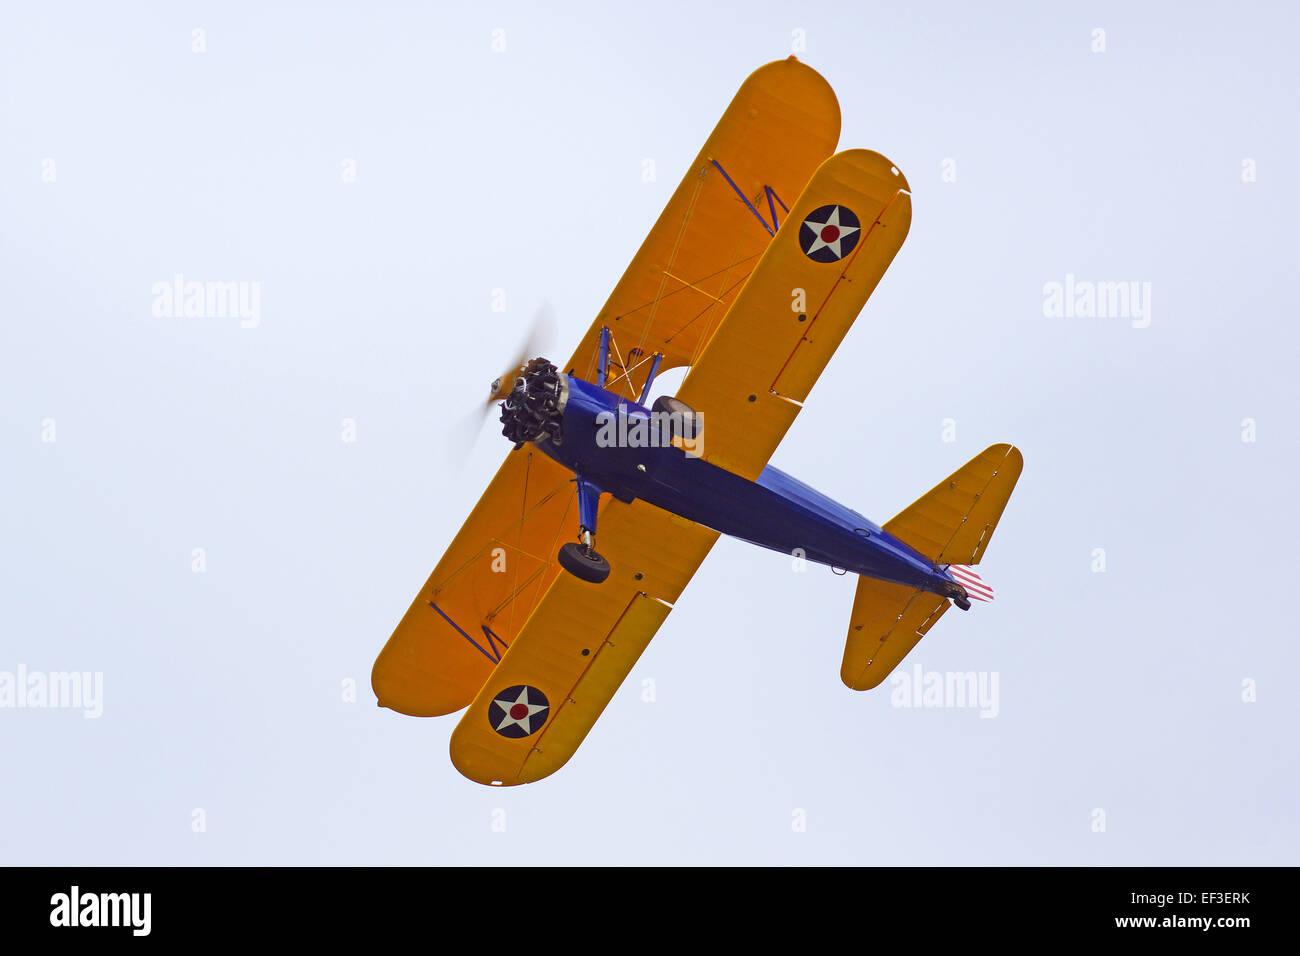 Airplane Bi-plane flying at 2015 Air show - Stock Image